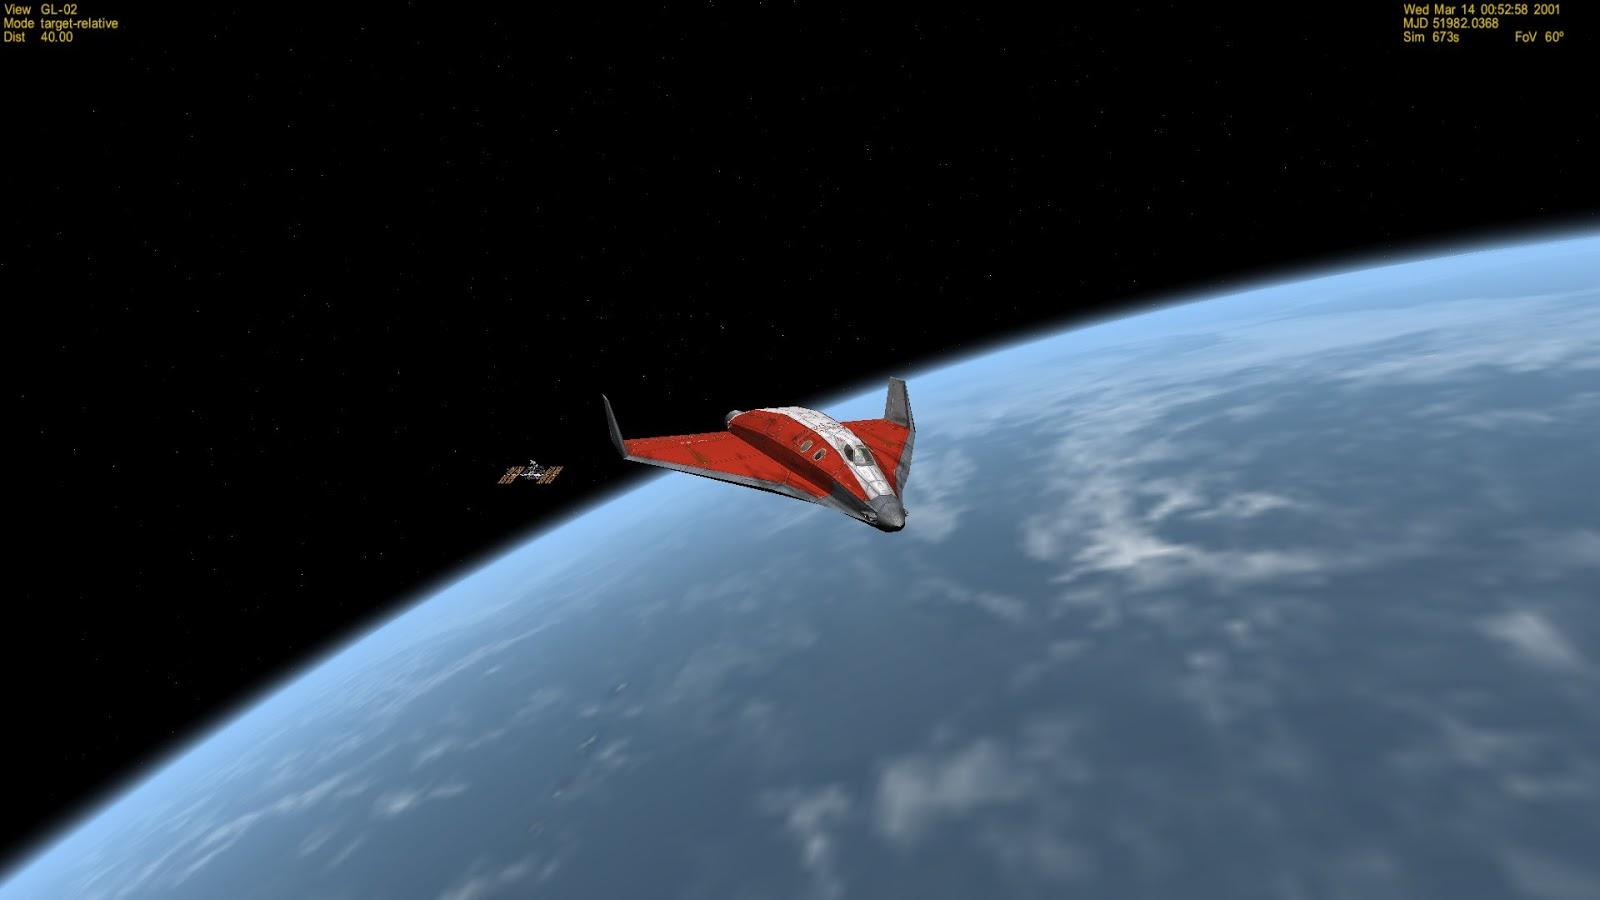 orbiter space flight simulator - photo #27